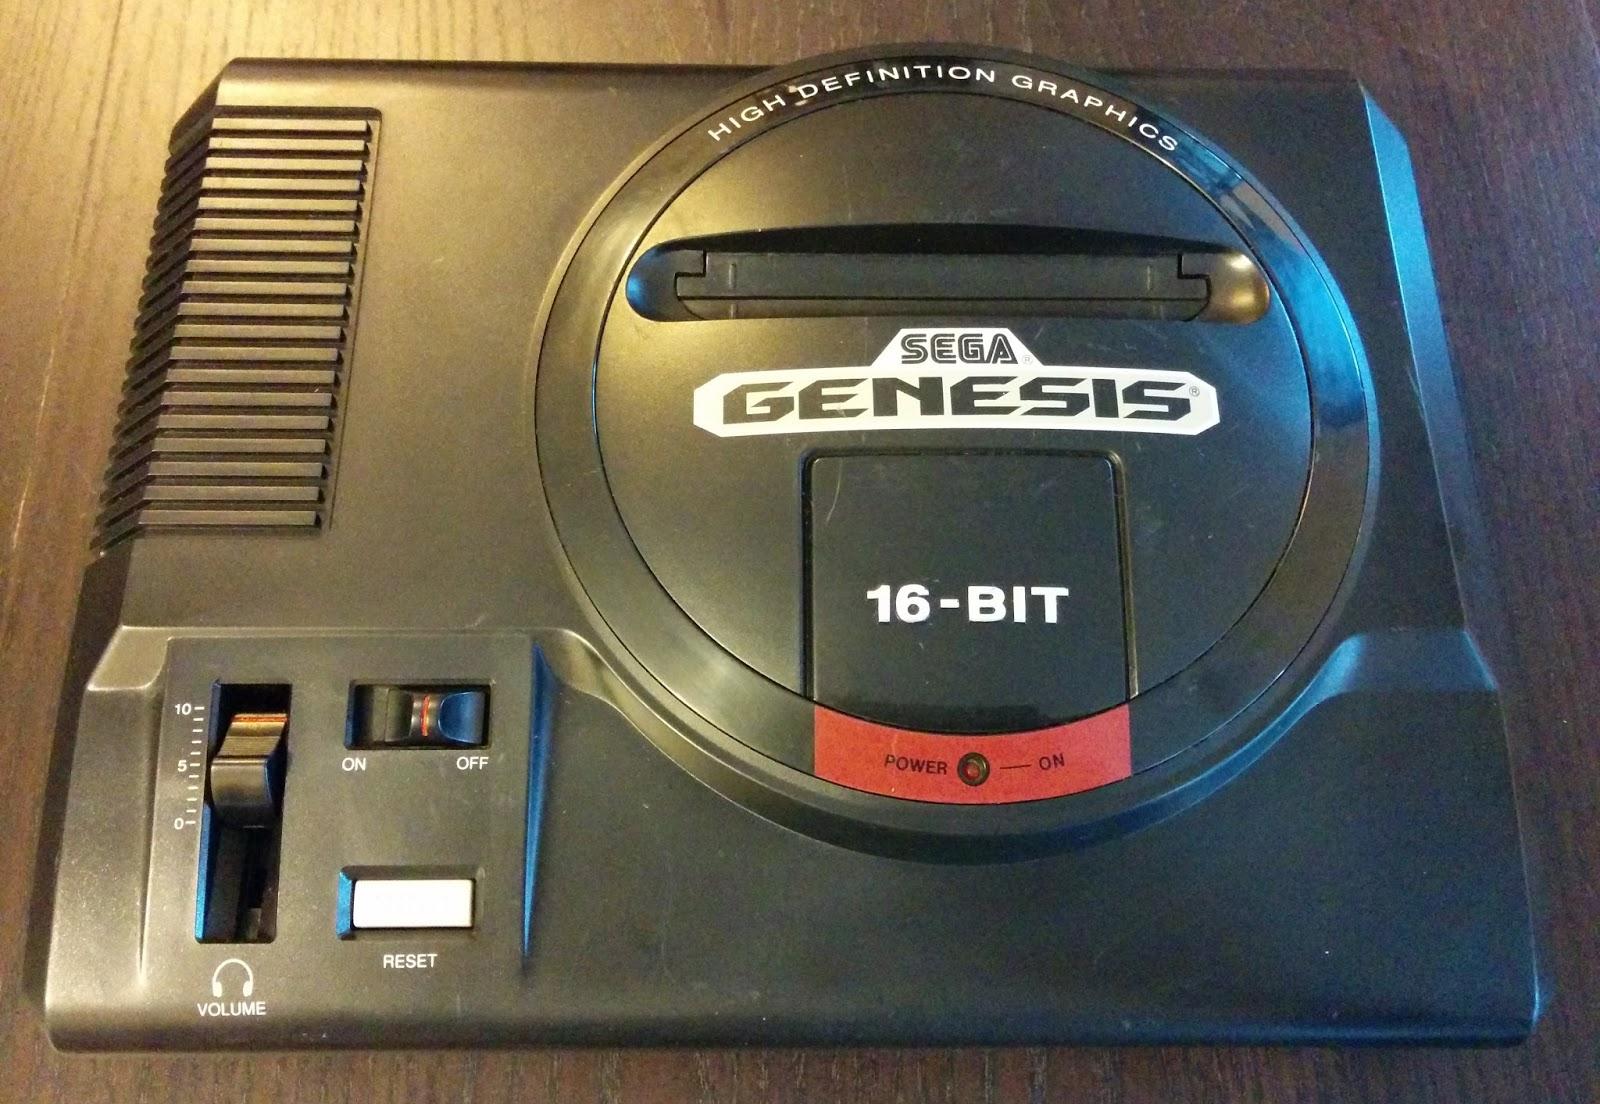 Nerdly Pleasures: Sega Genesis - Is the Stinker really that bad?